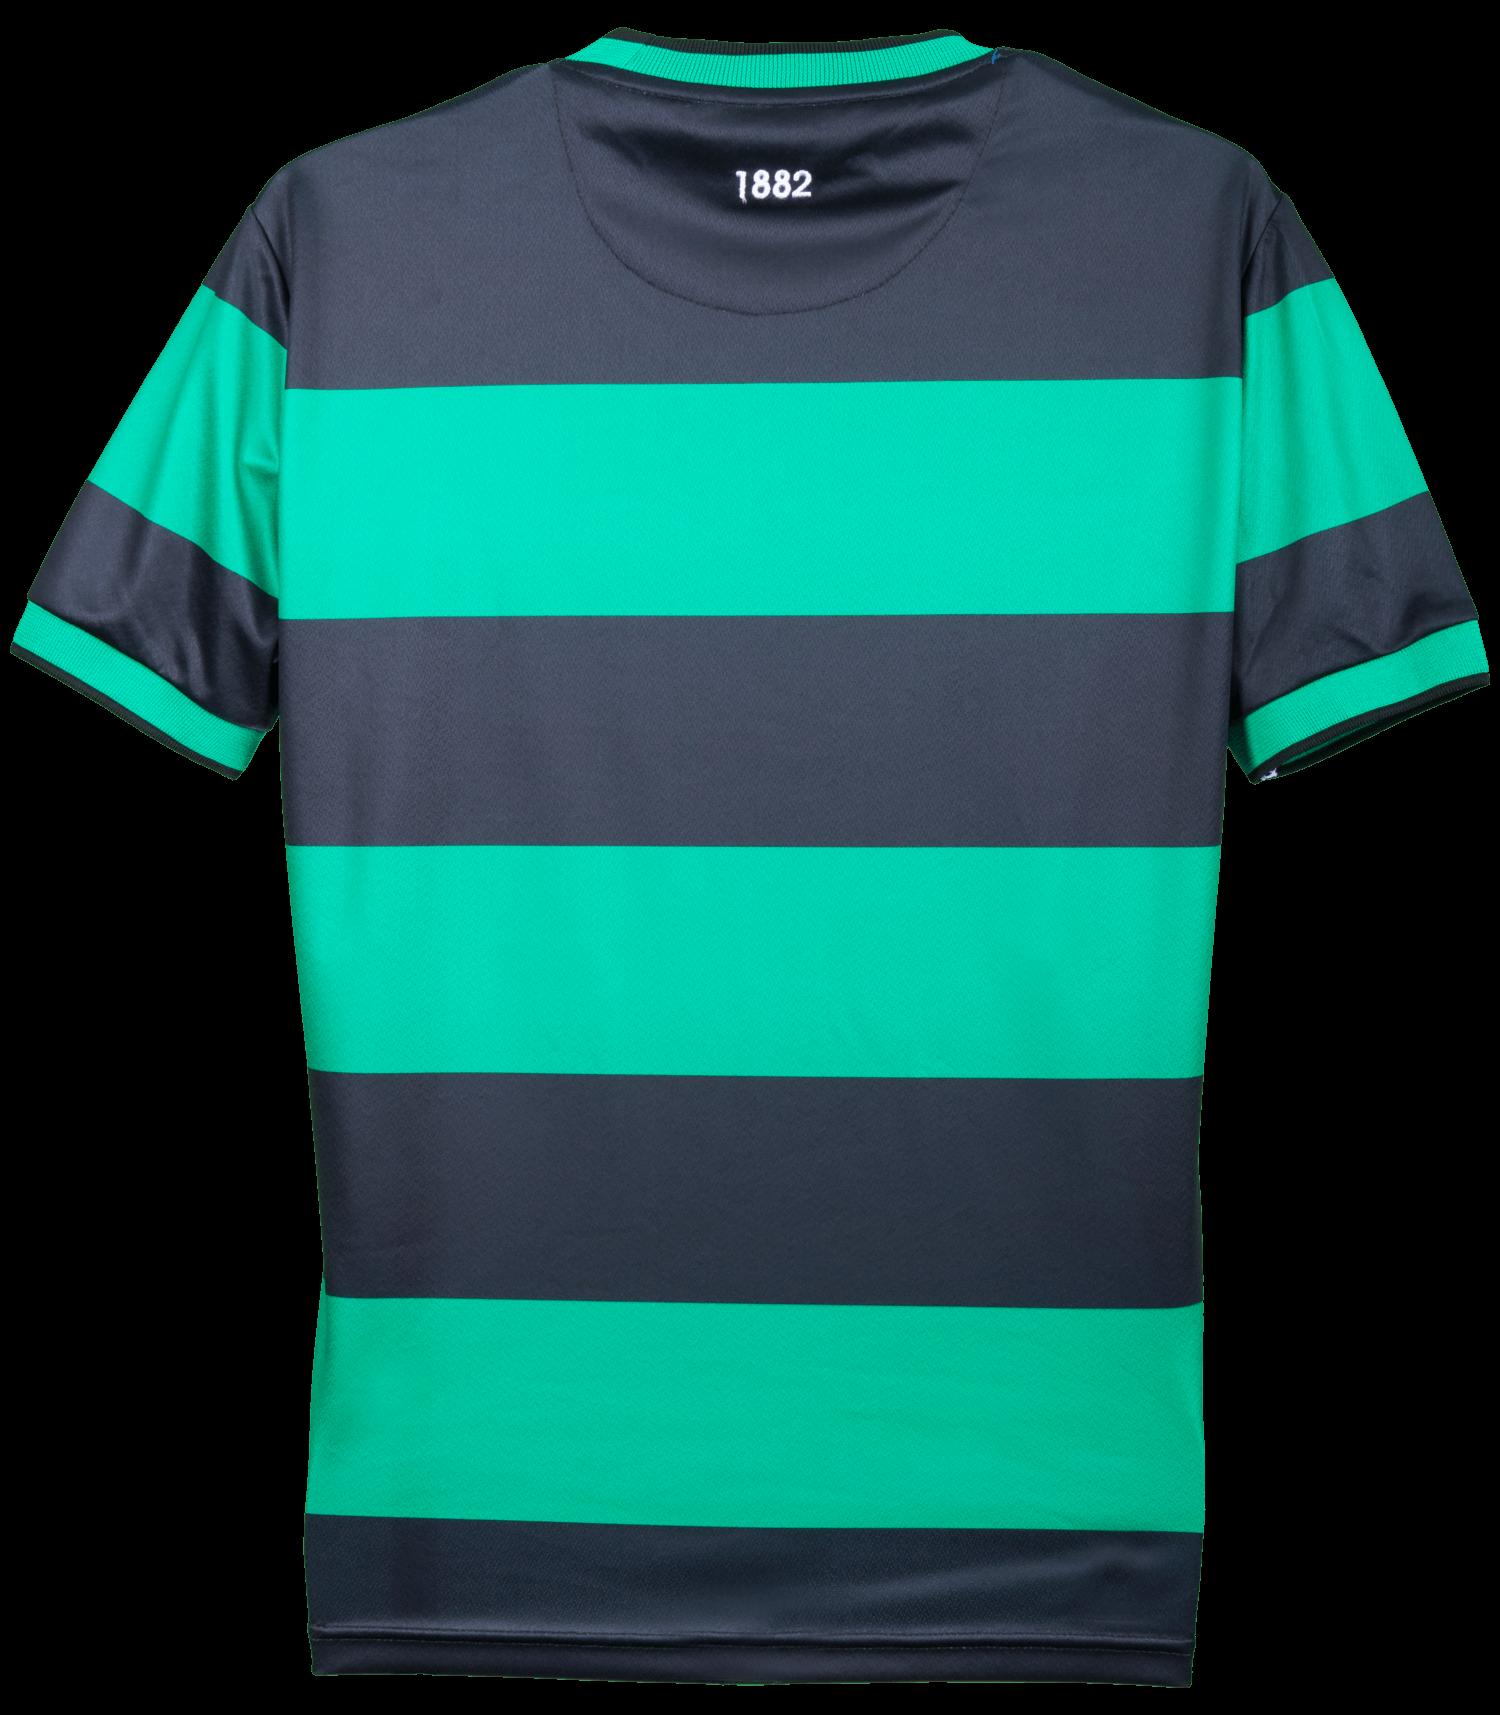 qpr-2017-18-third-shirt-back